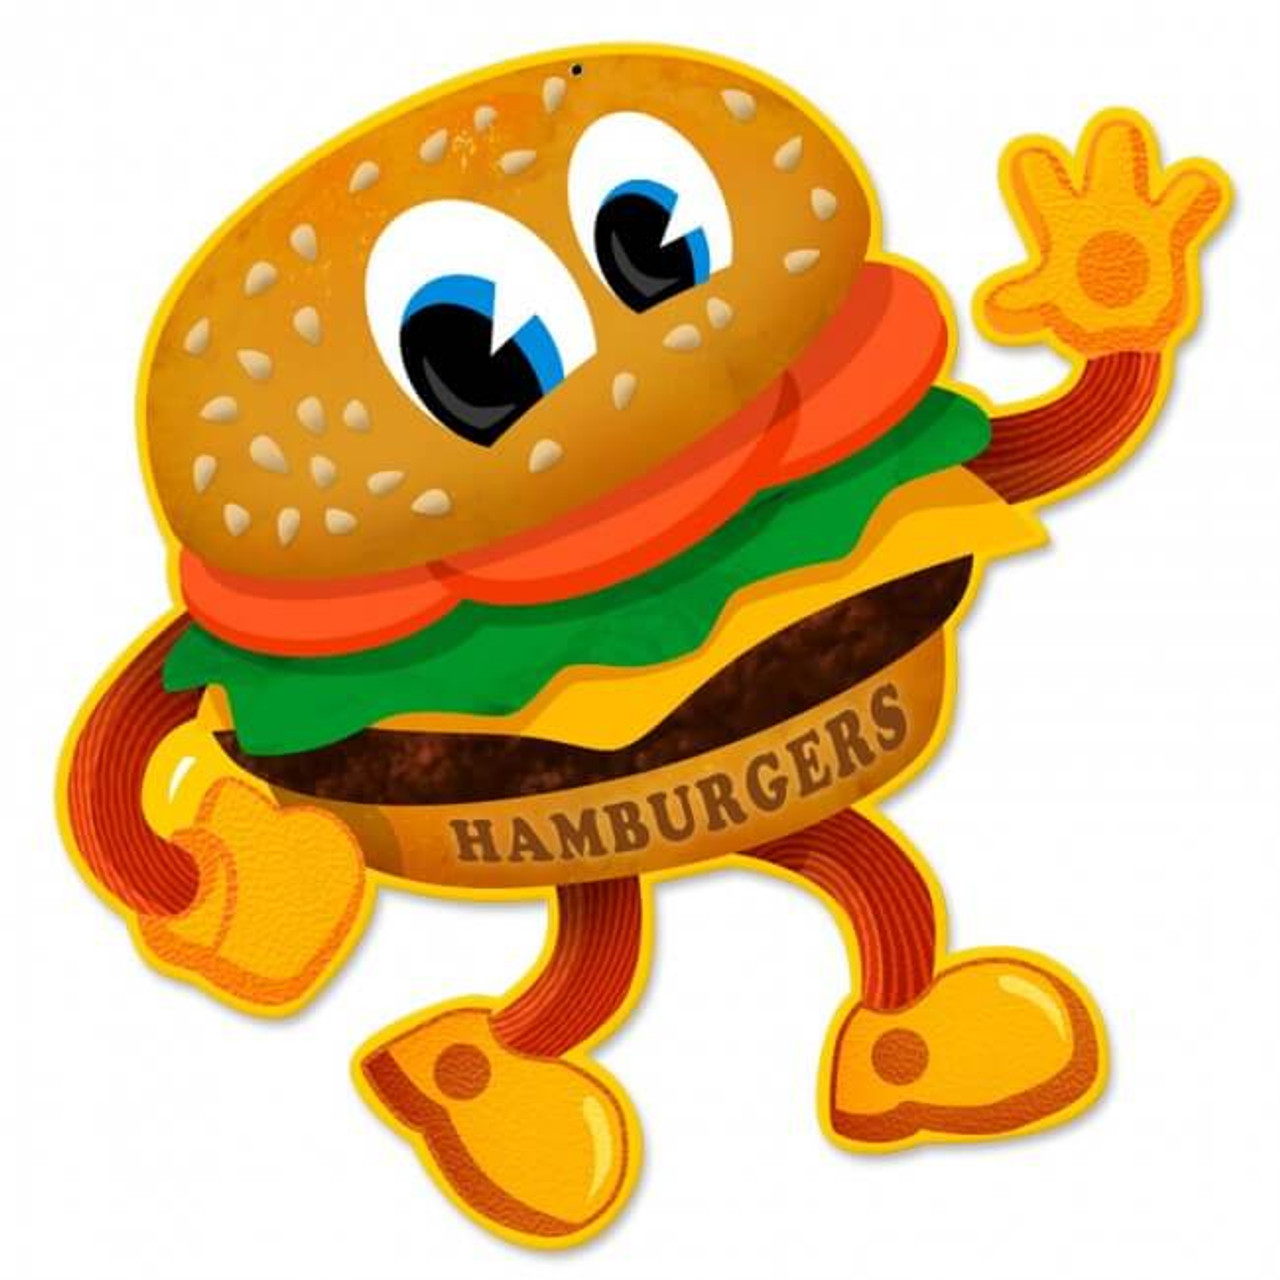 Retro Hamburger Metal Sign 19 x 20 inches